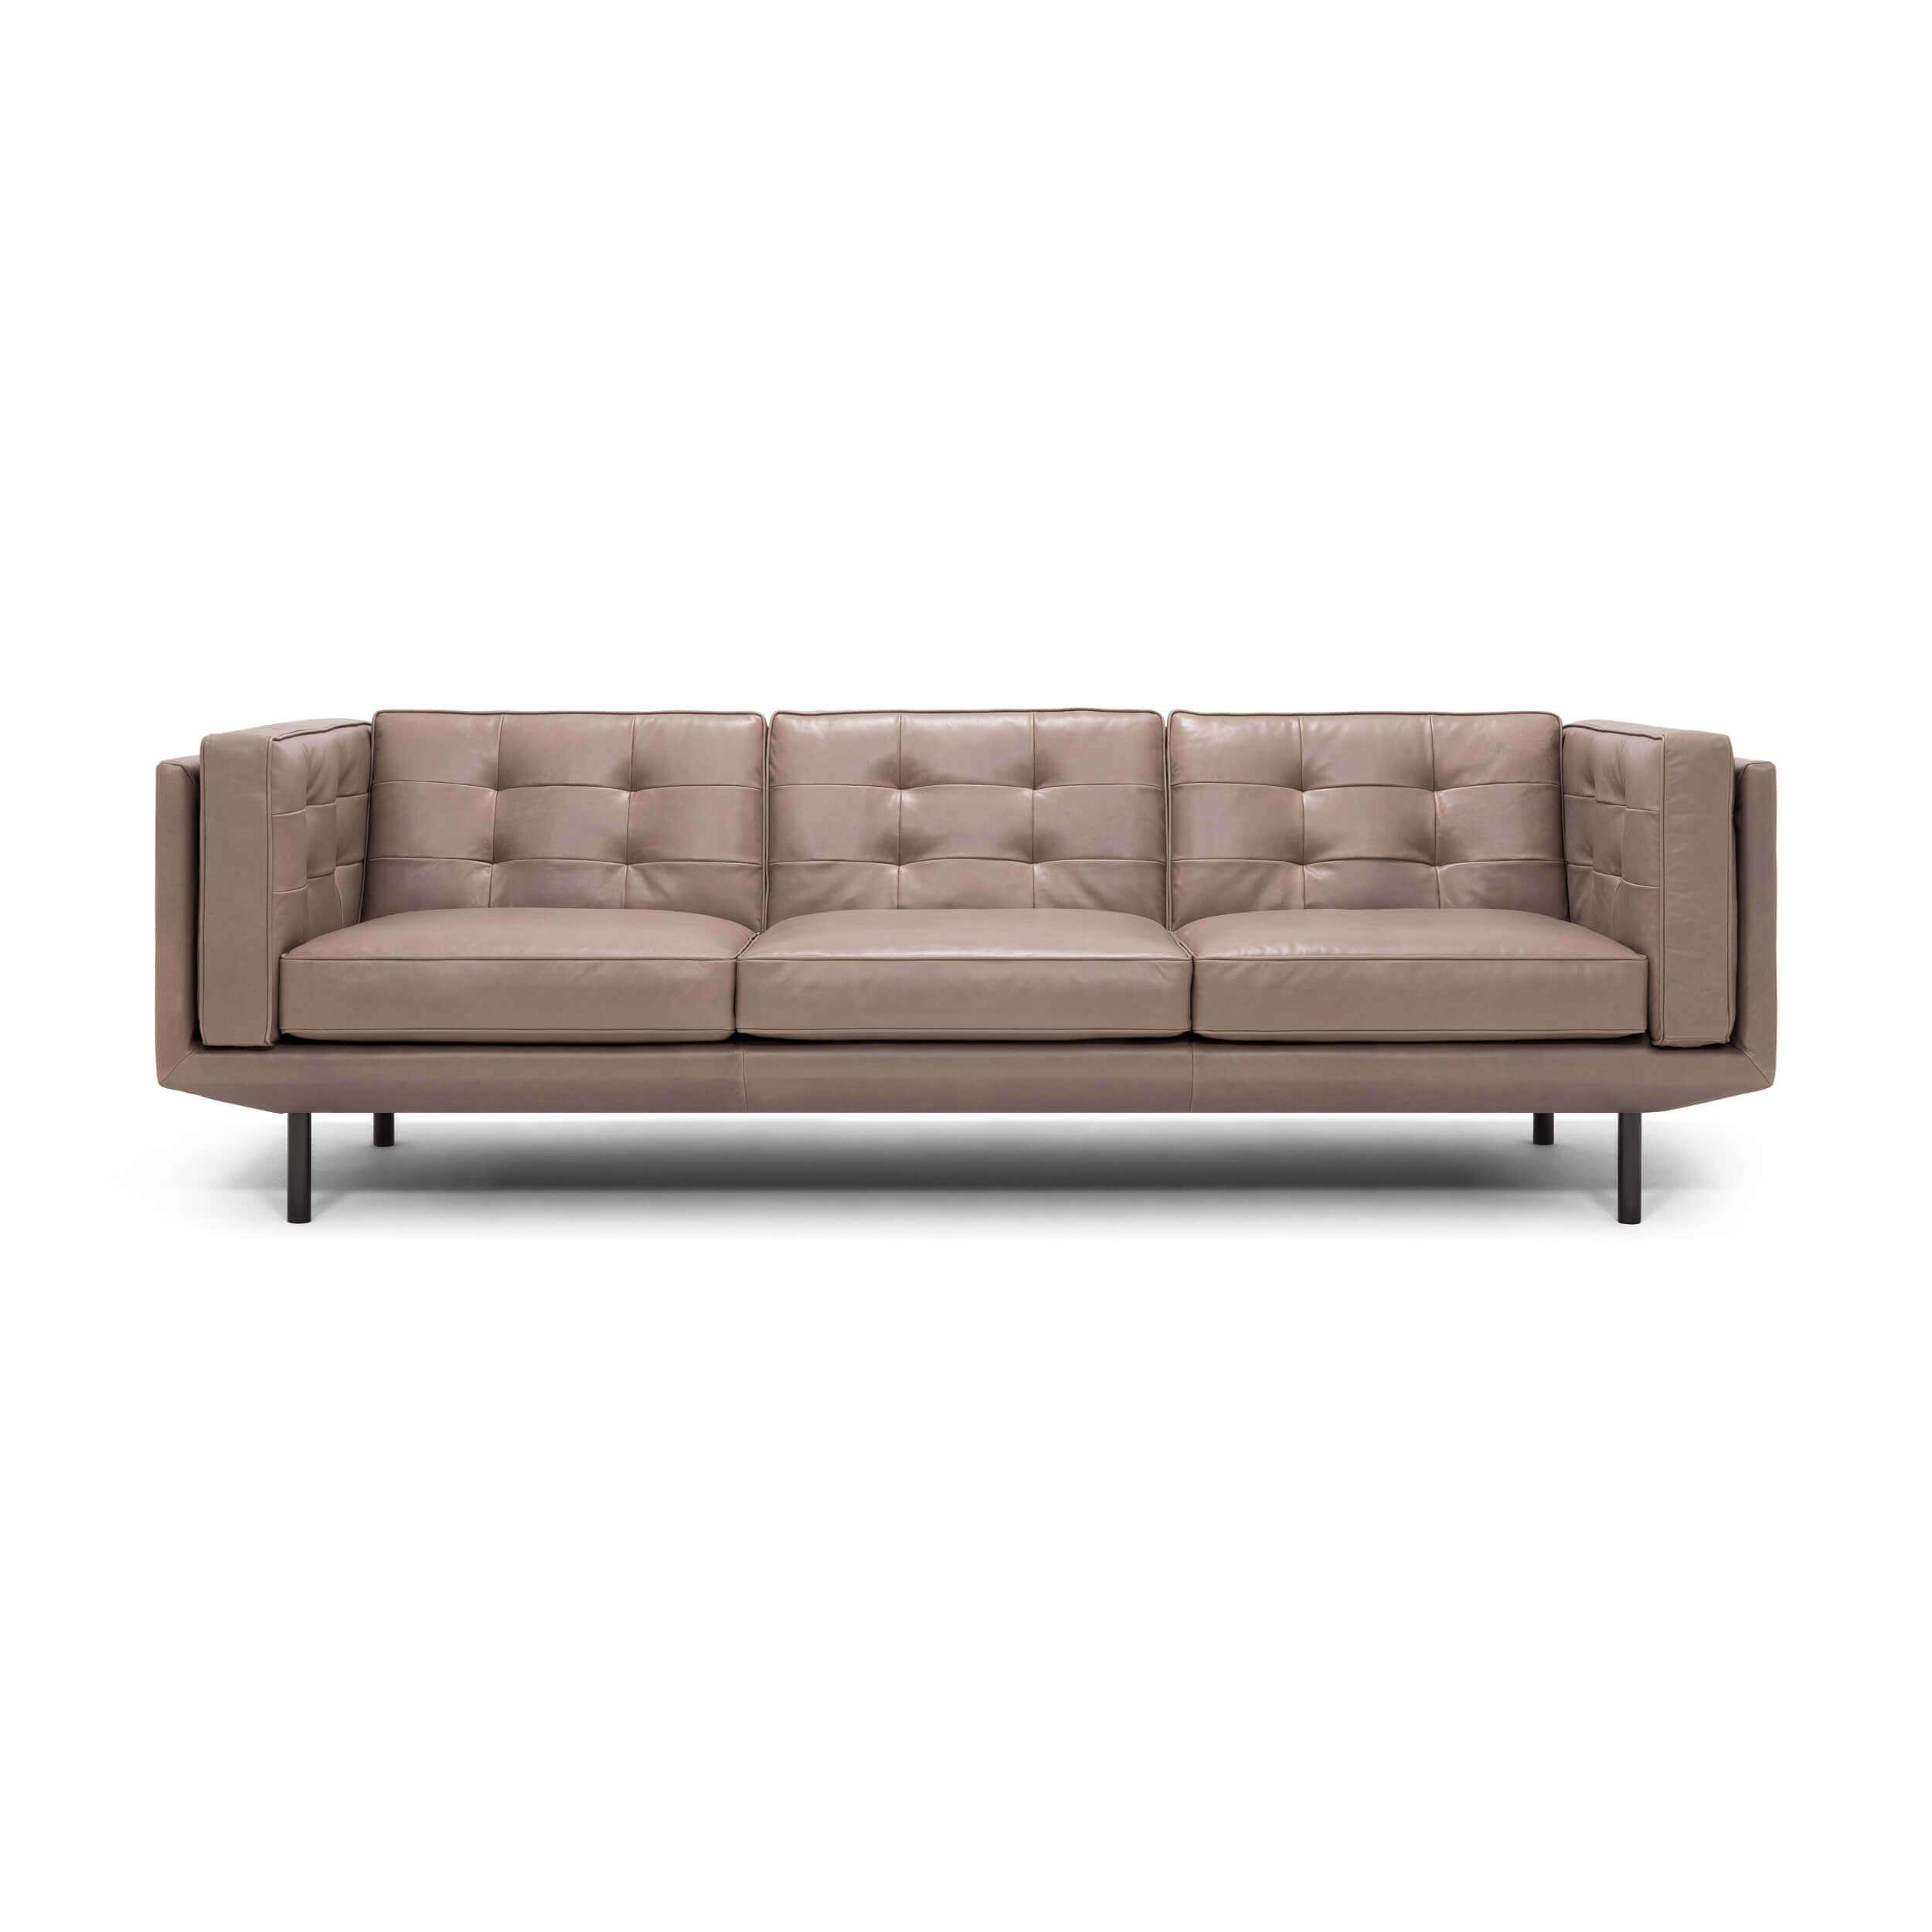 Astonishing Plateau 94 Sofa Blind Pull Leather Uwap Interior Chair Design Uwaporg